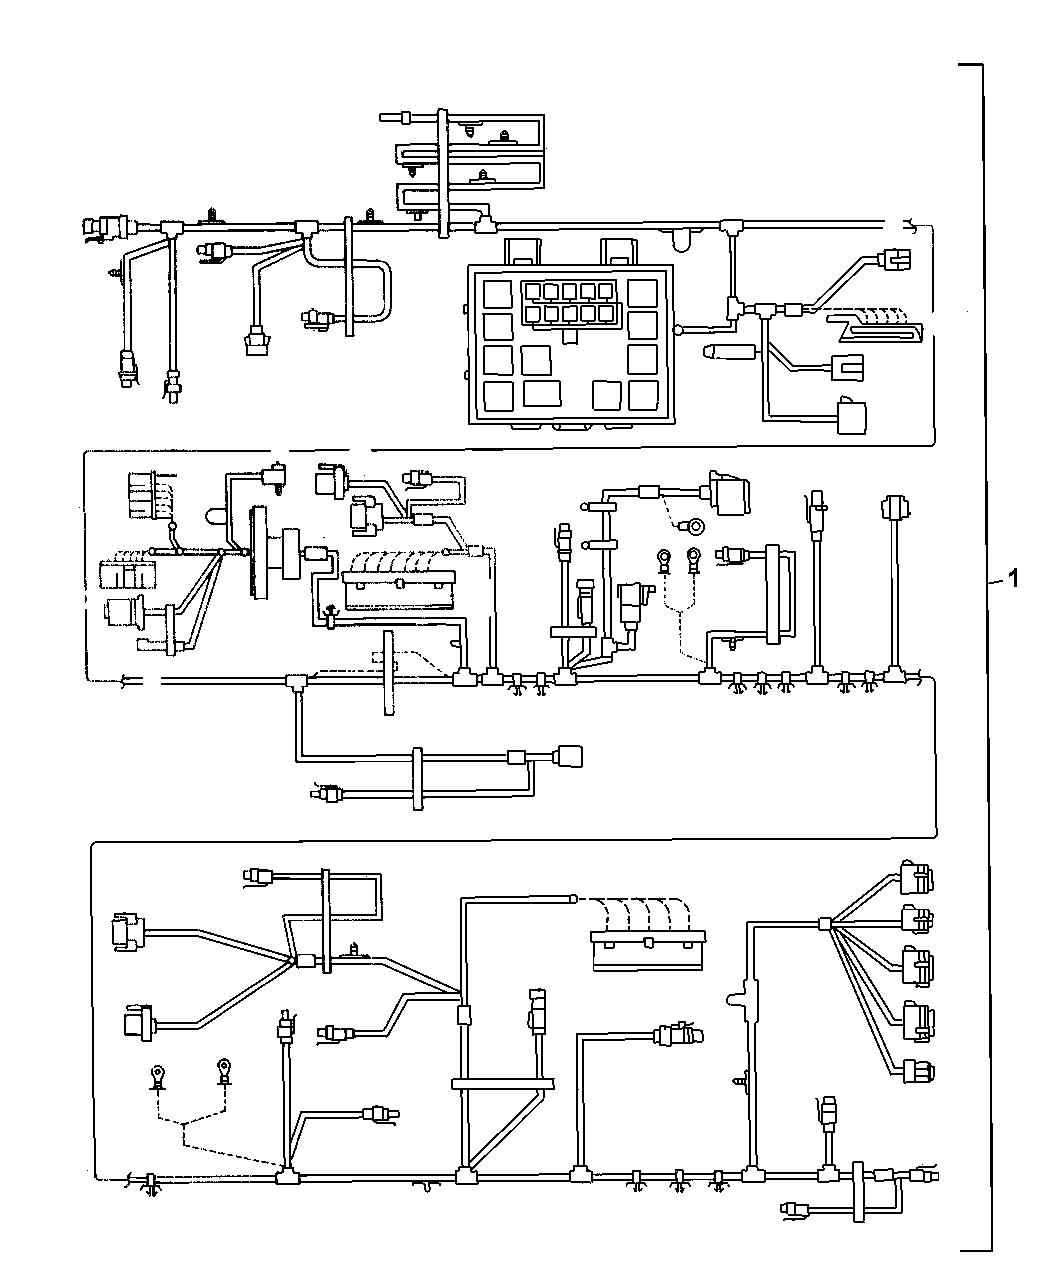 Diagram Chrysler 300m Radio Wiring Diagram Full Version Hd Quality Wiring Diagram Blogxfick Achatsenchine Fr